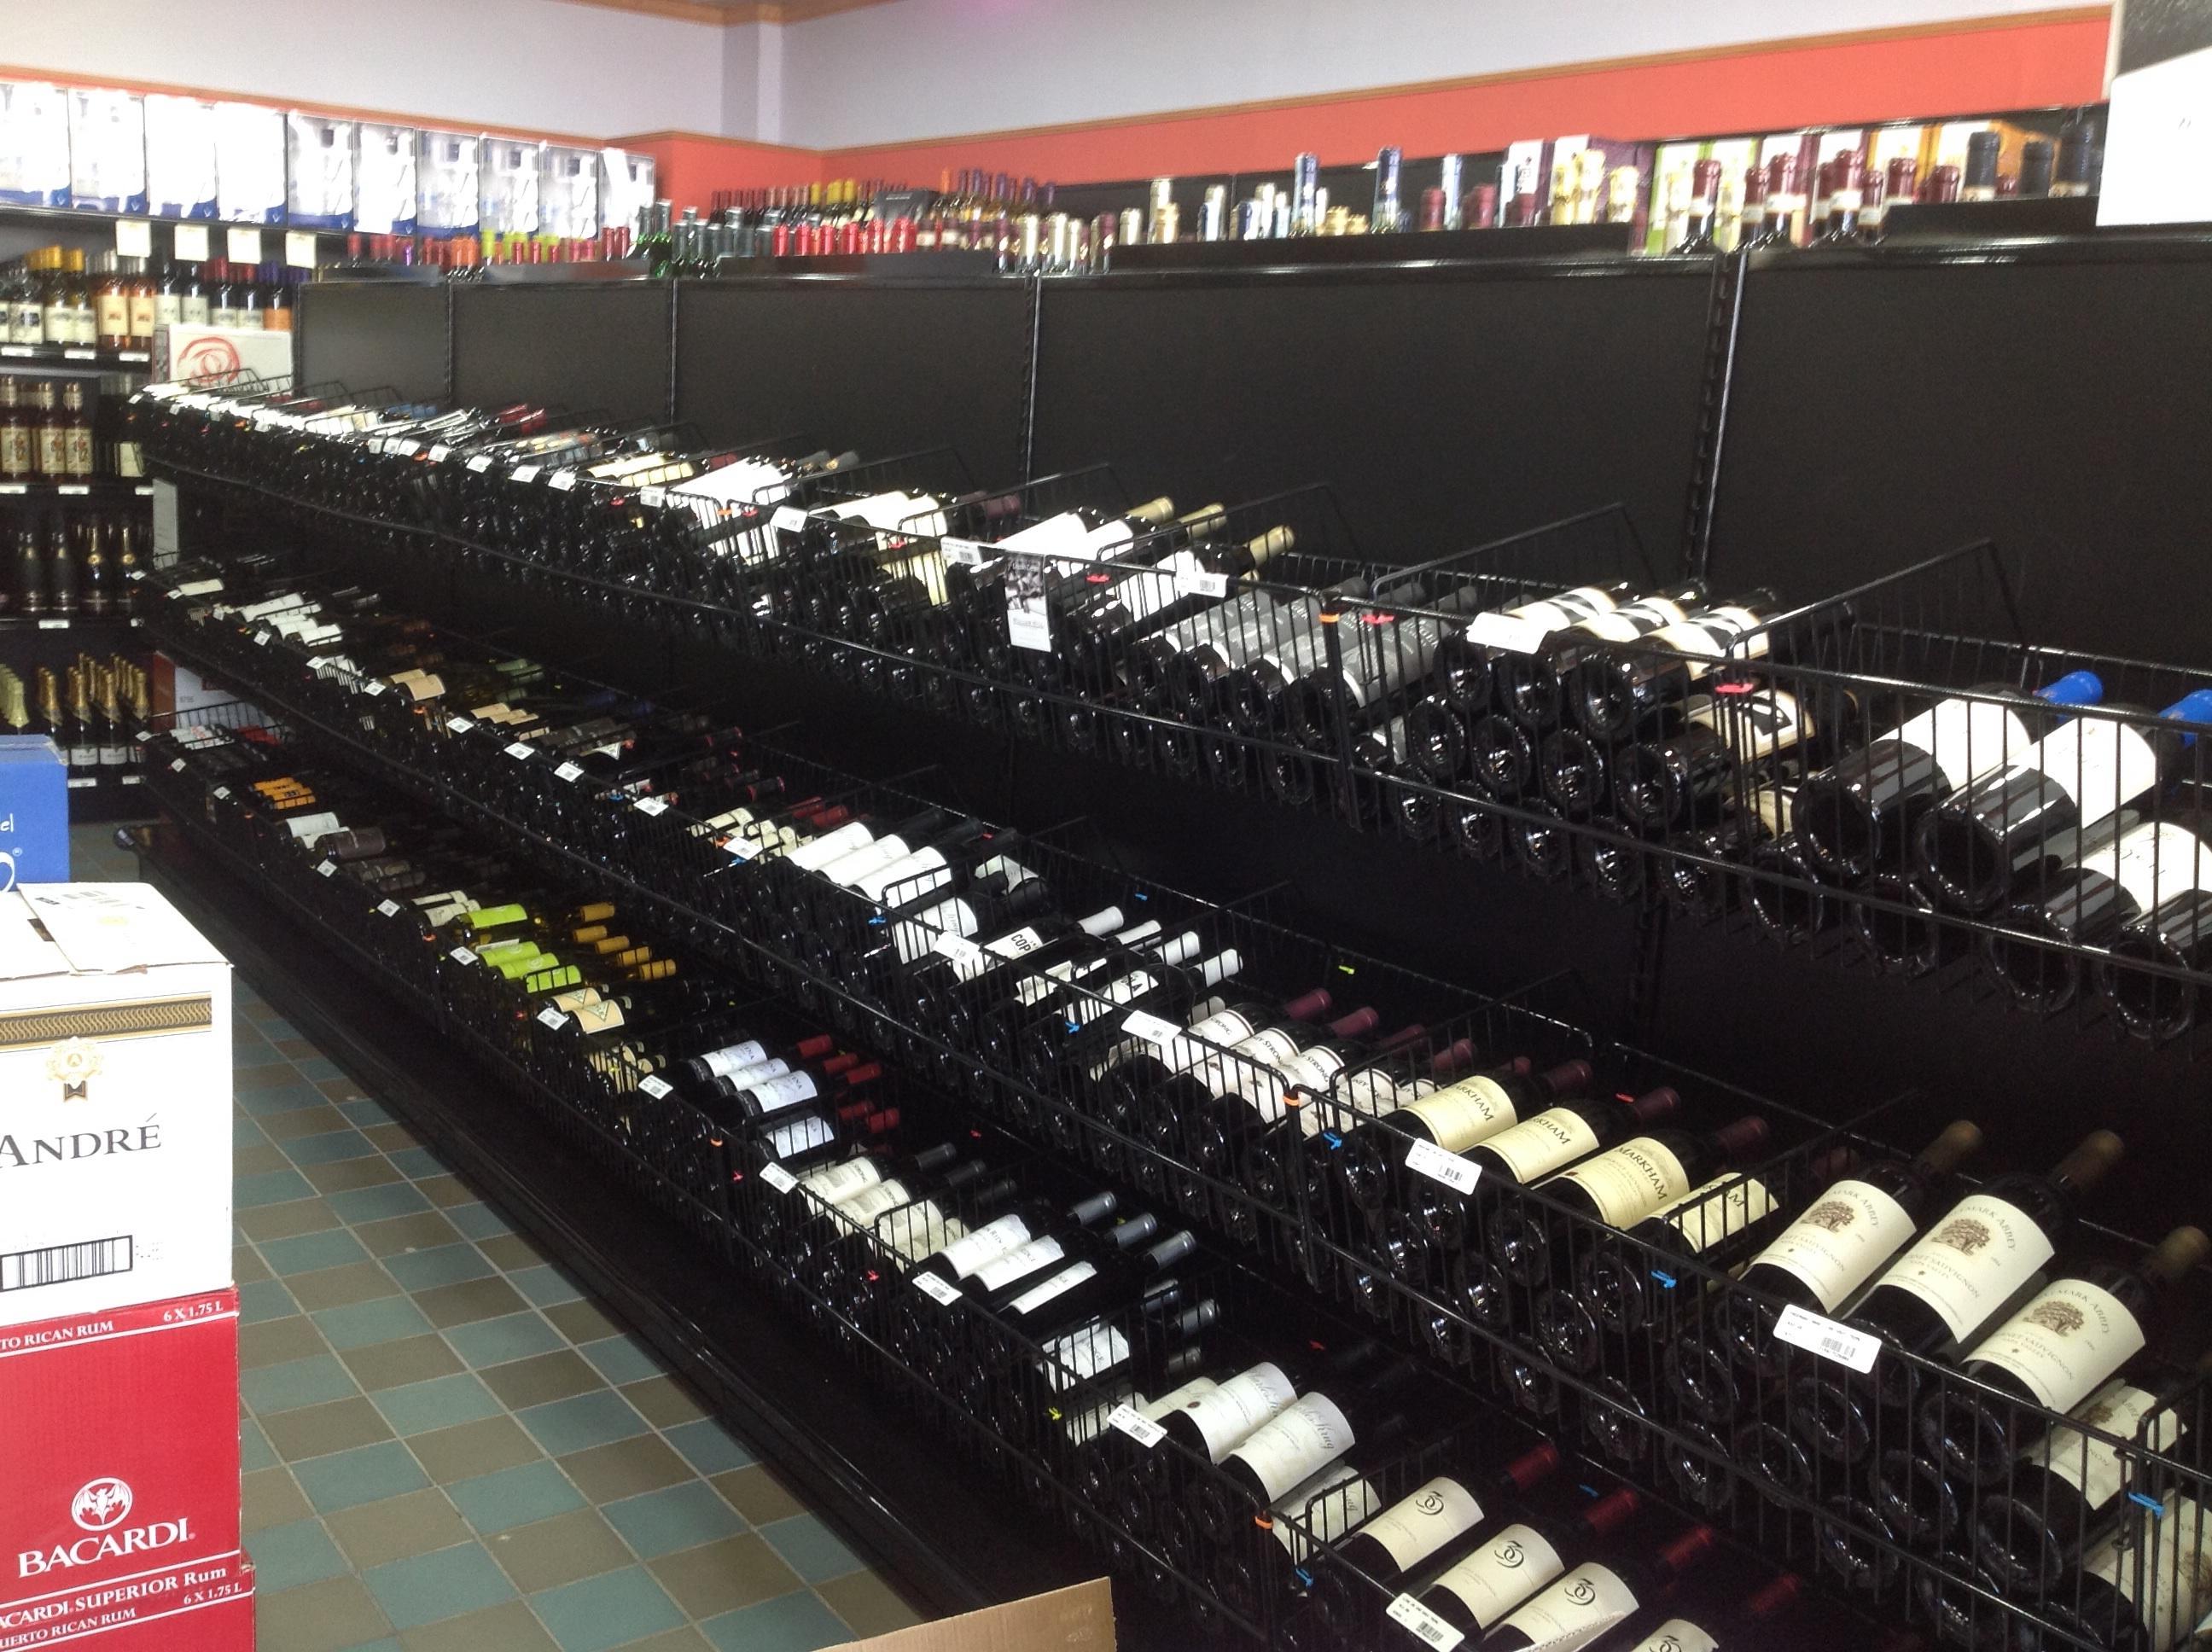 Wantagh Wine & Liquor image 5